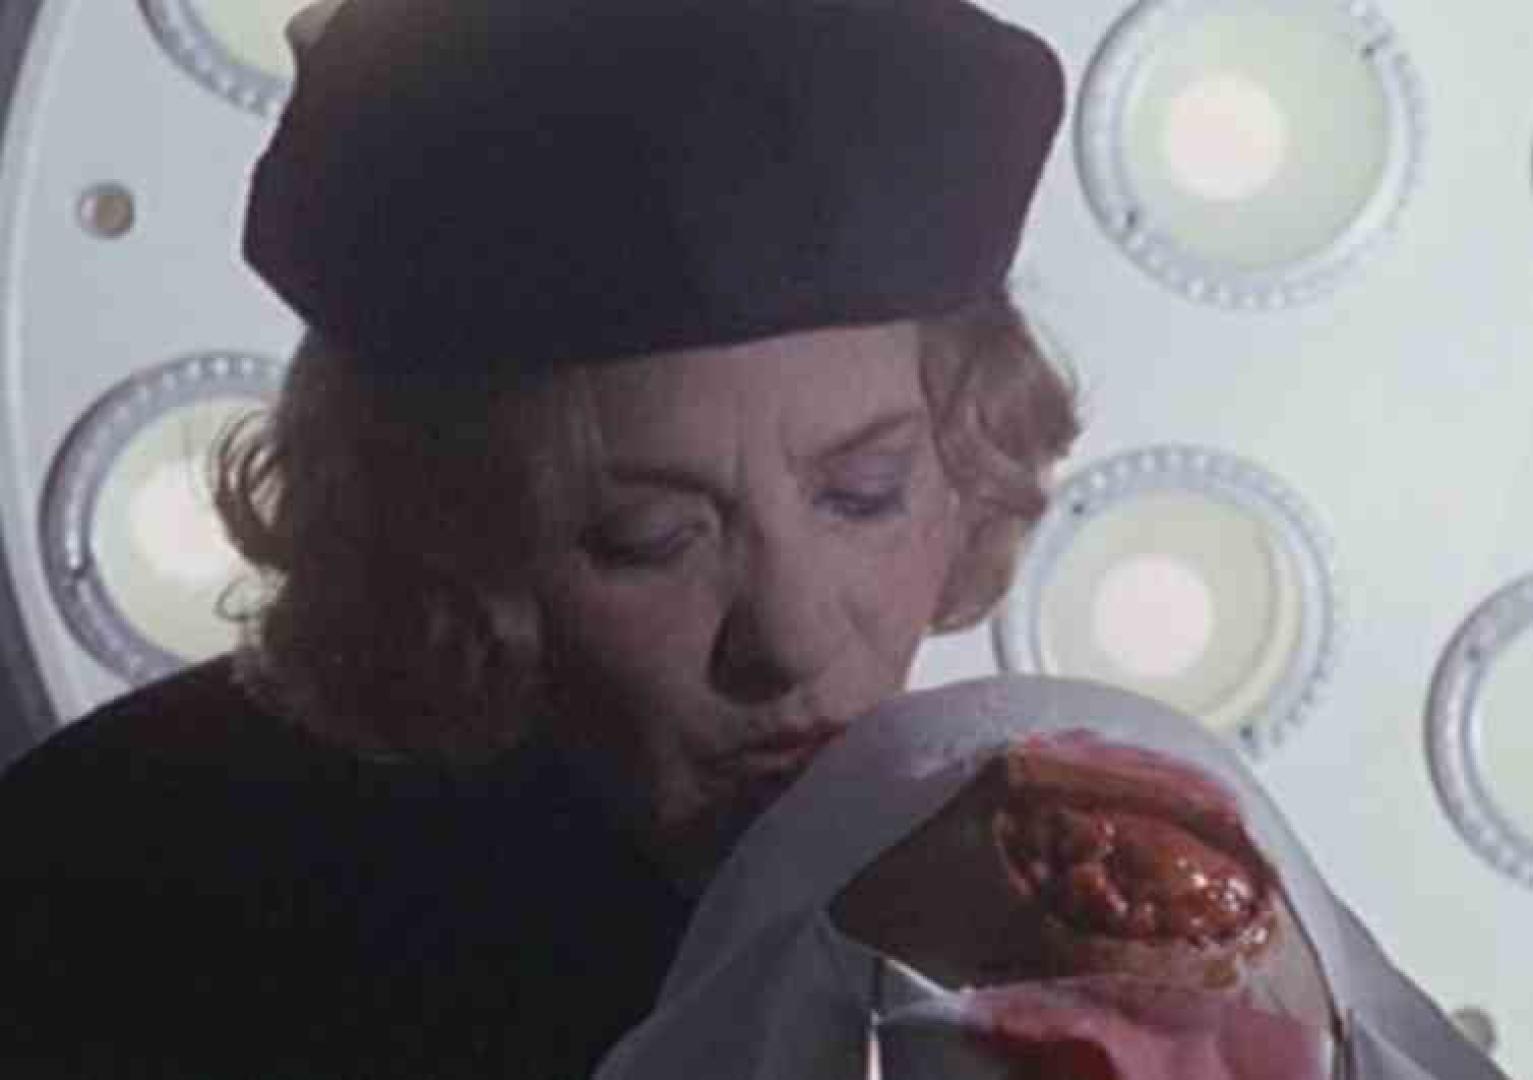 Suor Omicidi - A gyilkos apáca (1979) 1. kép